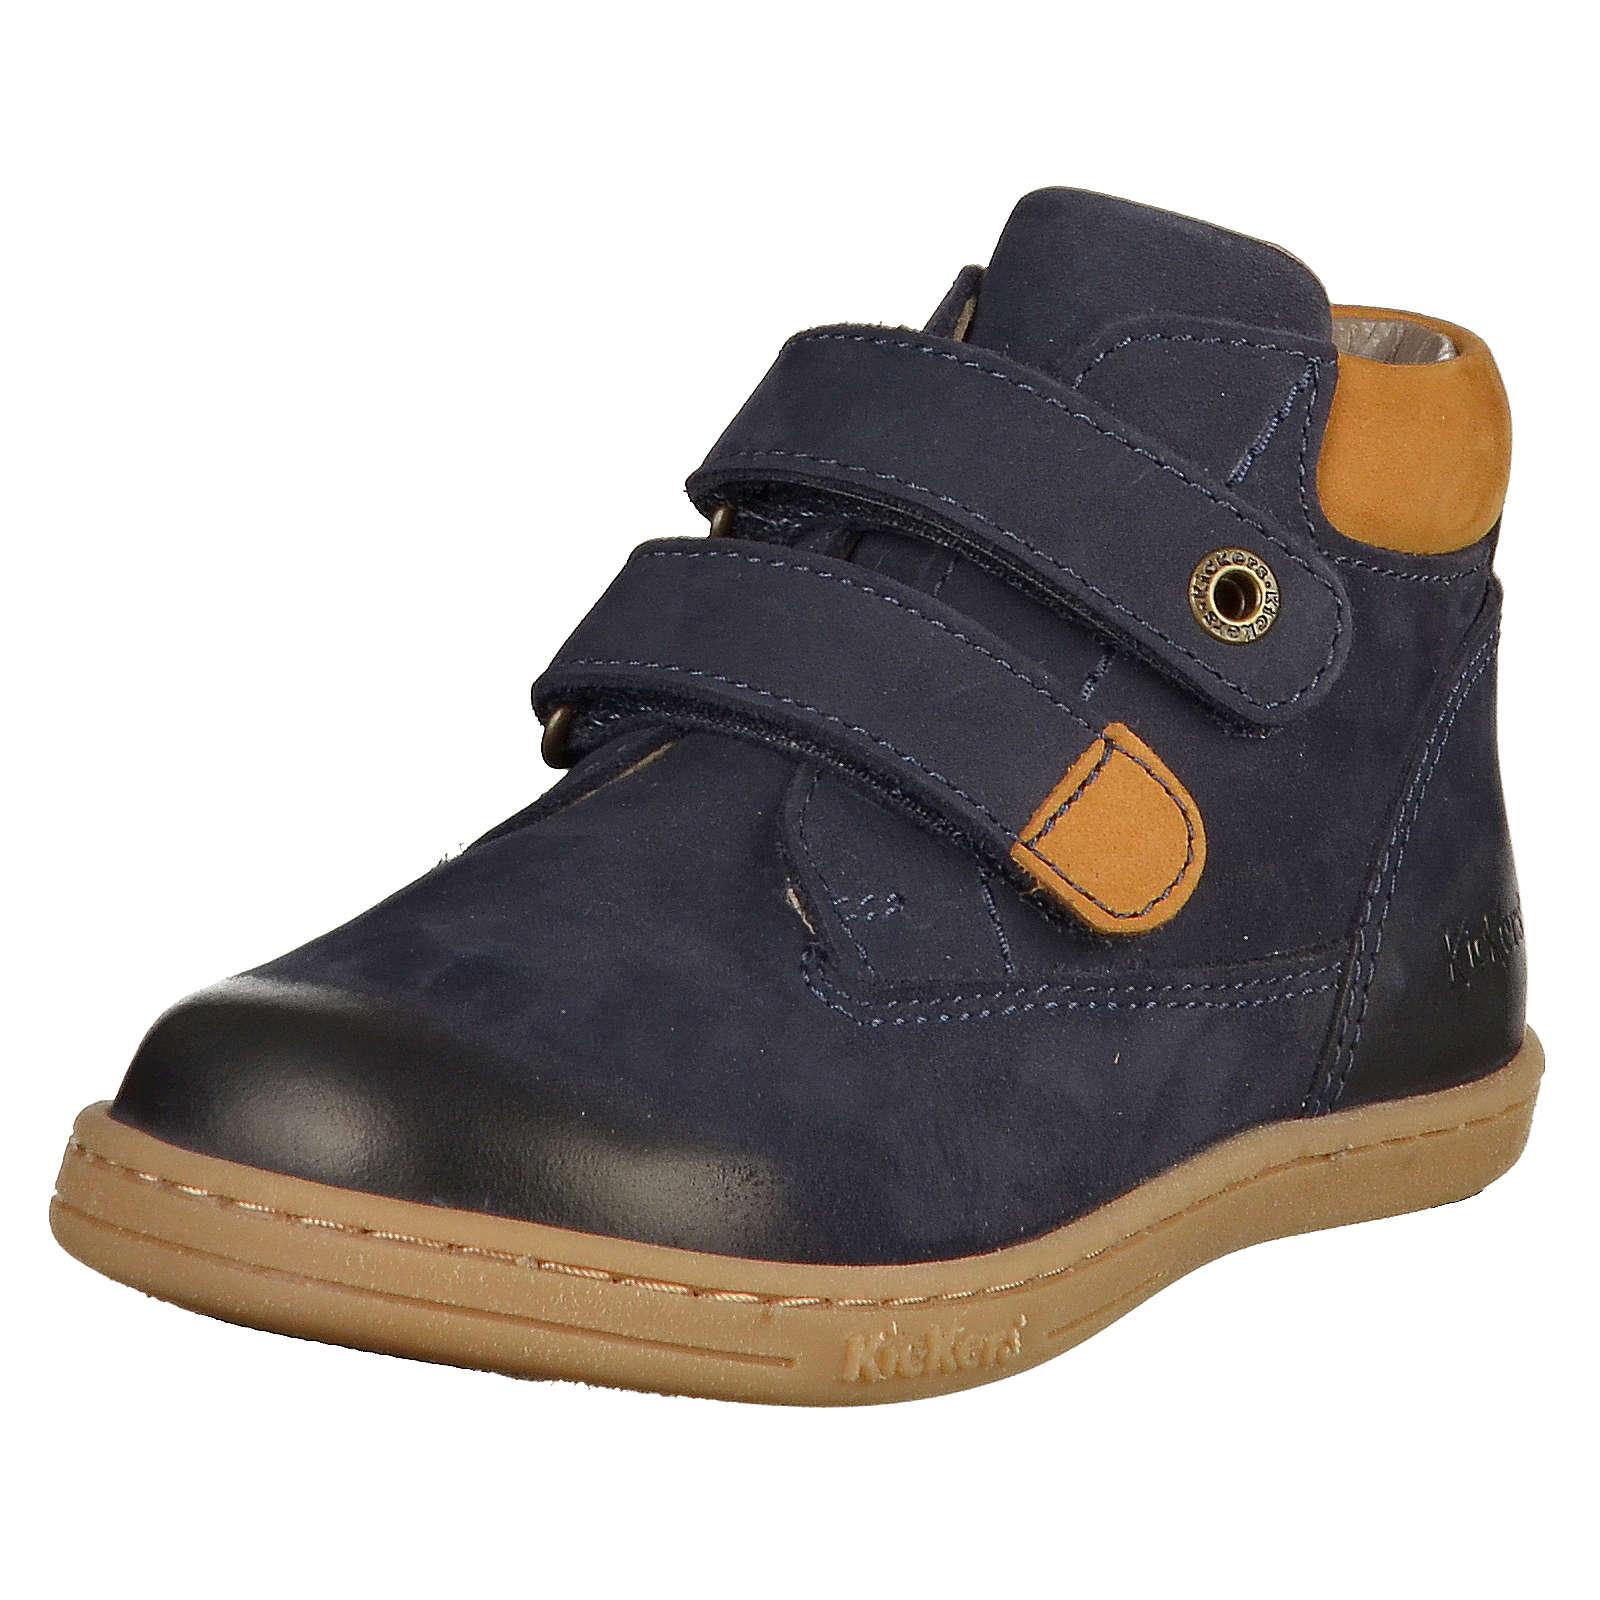 KicKers Sneakers Low für Jungen blau Junge Gr. 20